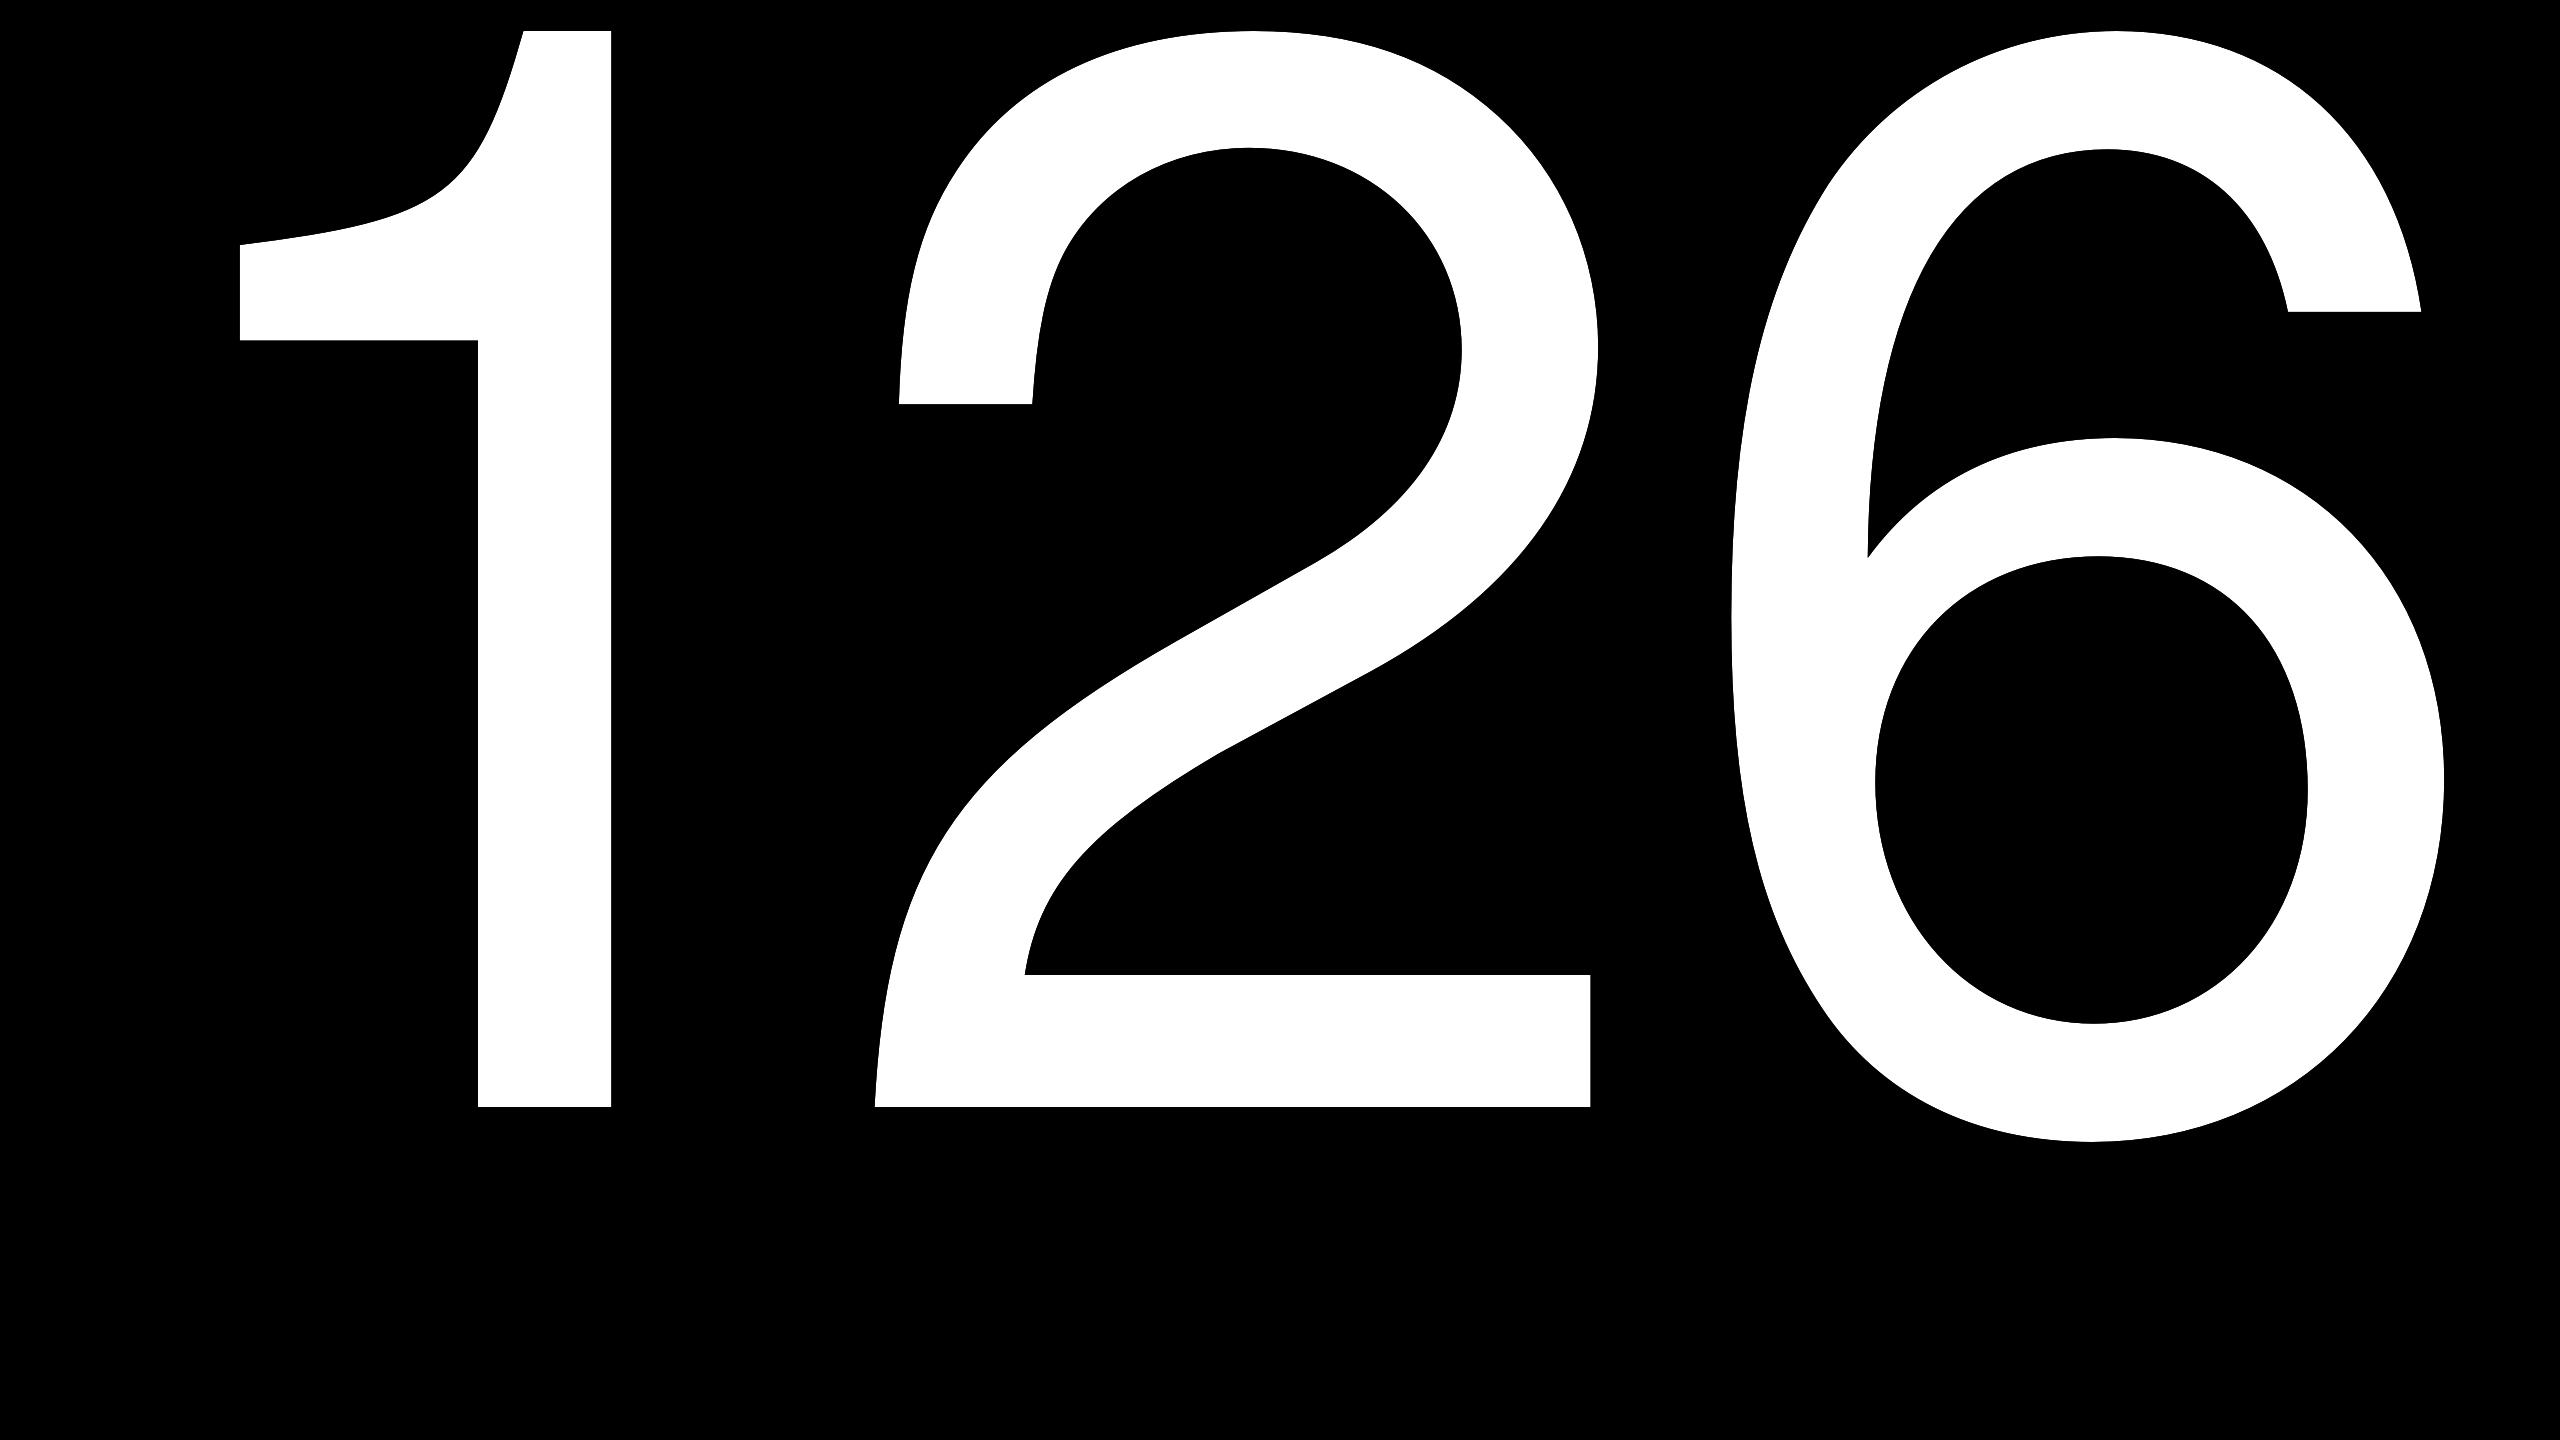 126 (number)